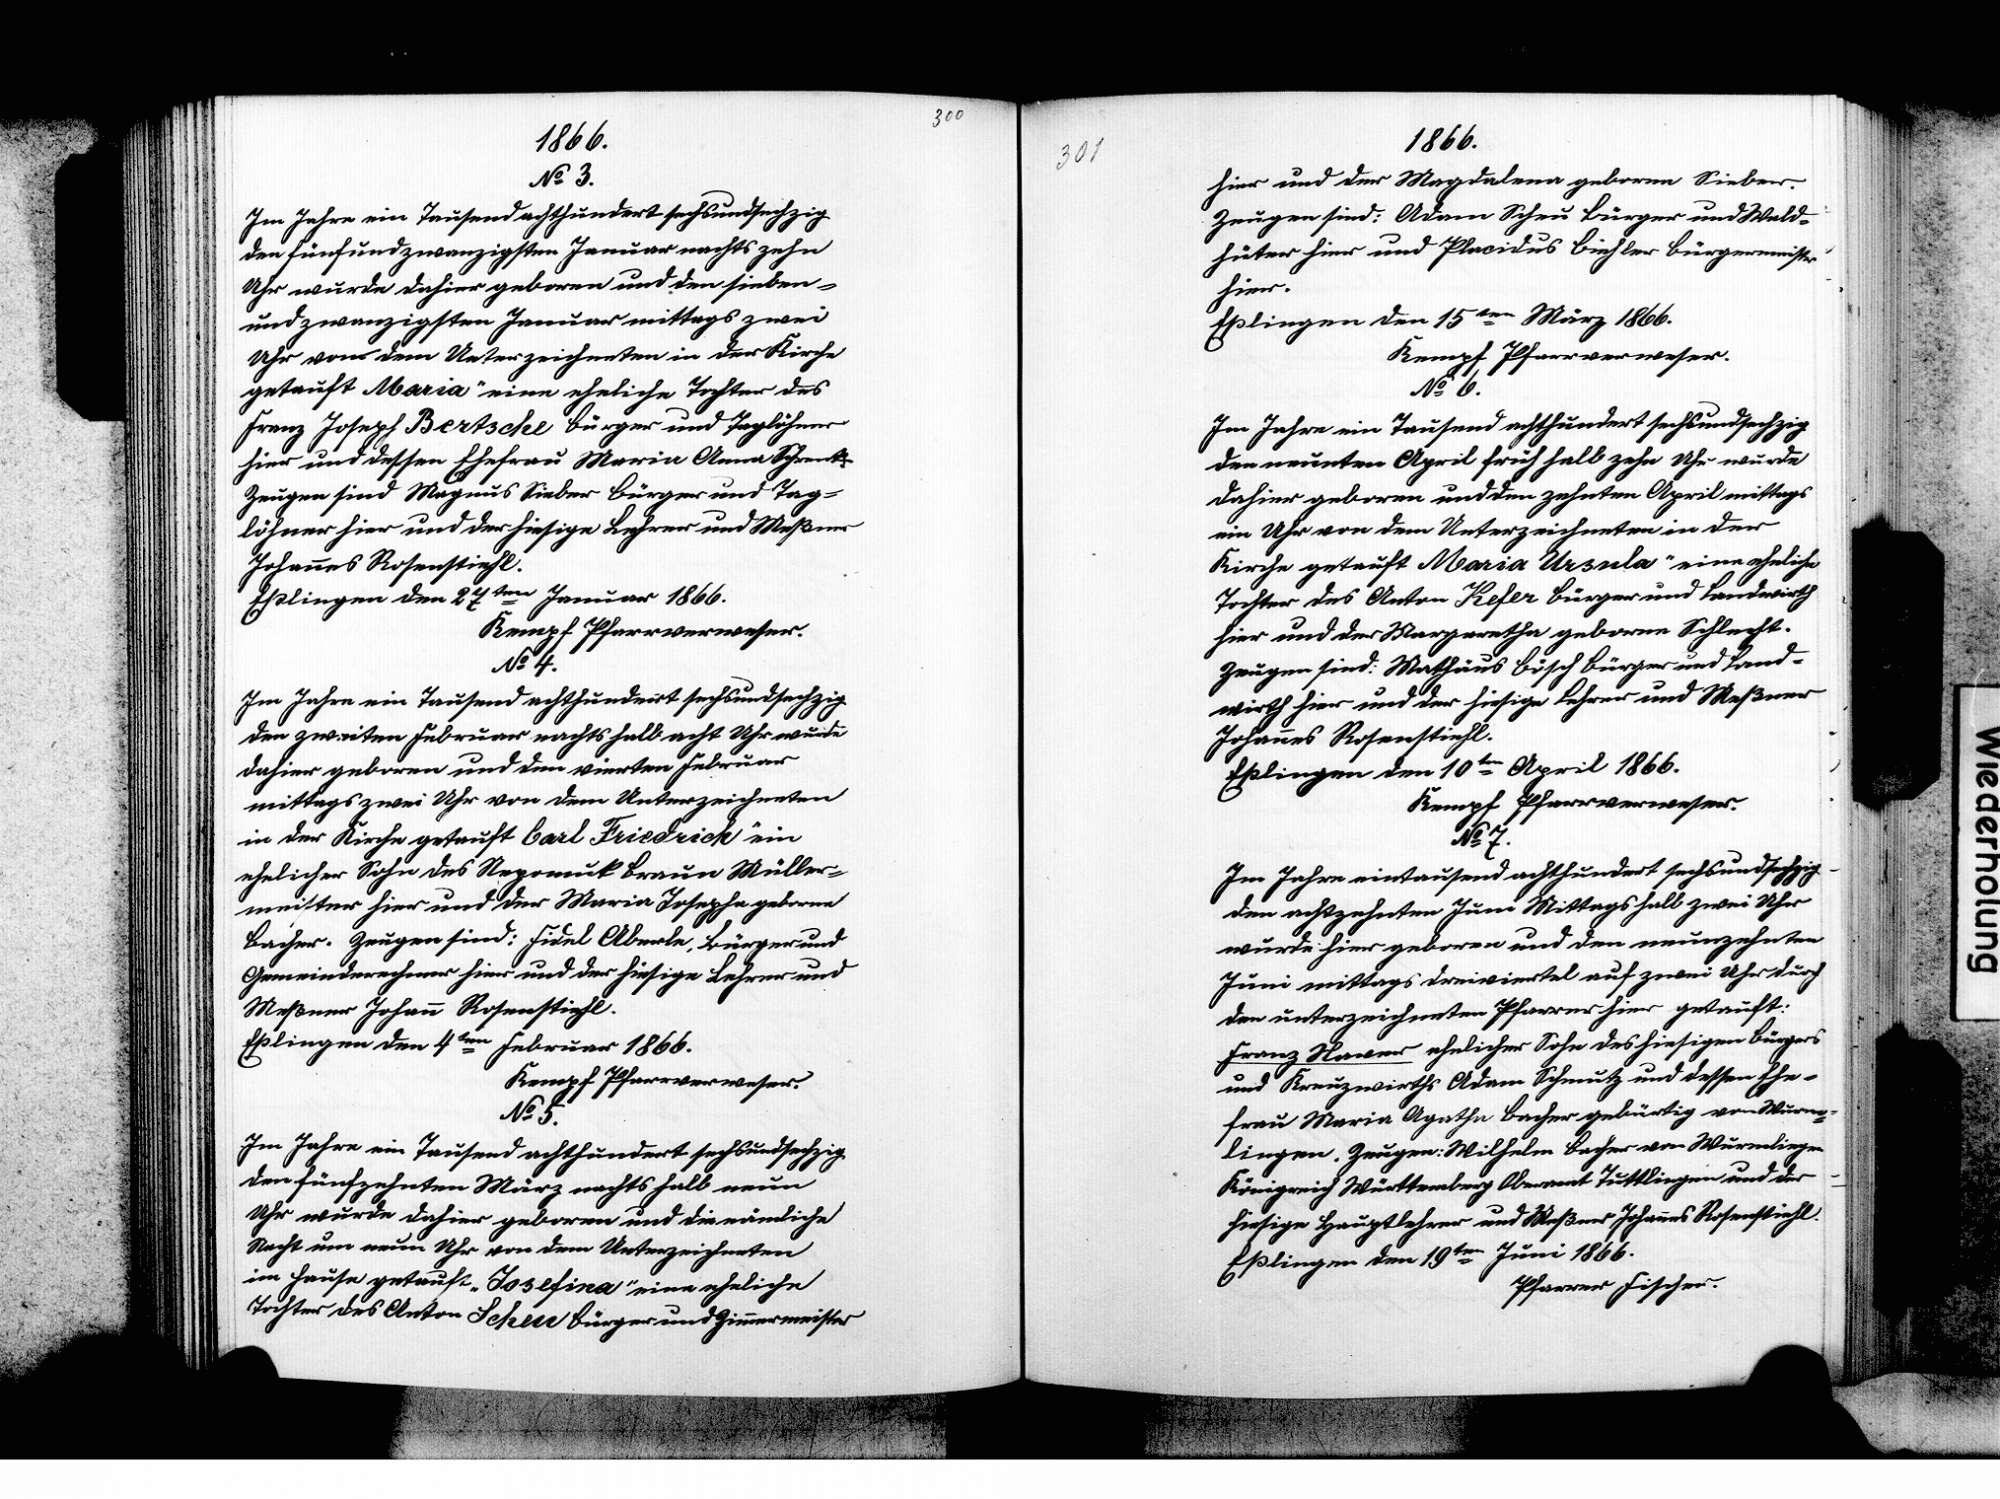 Eßlingen, Tuttlingen TUT; Katholische Gemeinde: Standesbuch 1810-1870, Bild 3